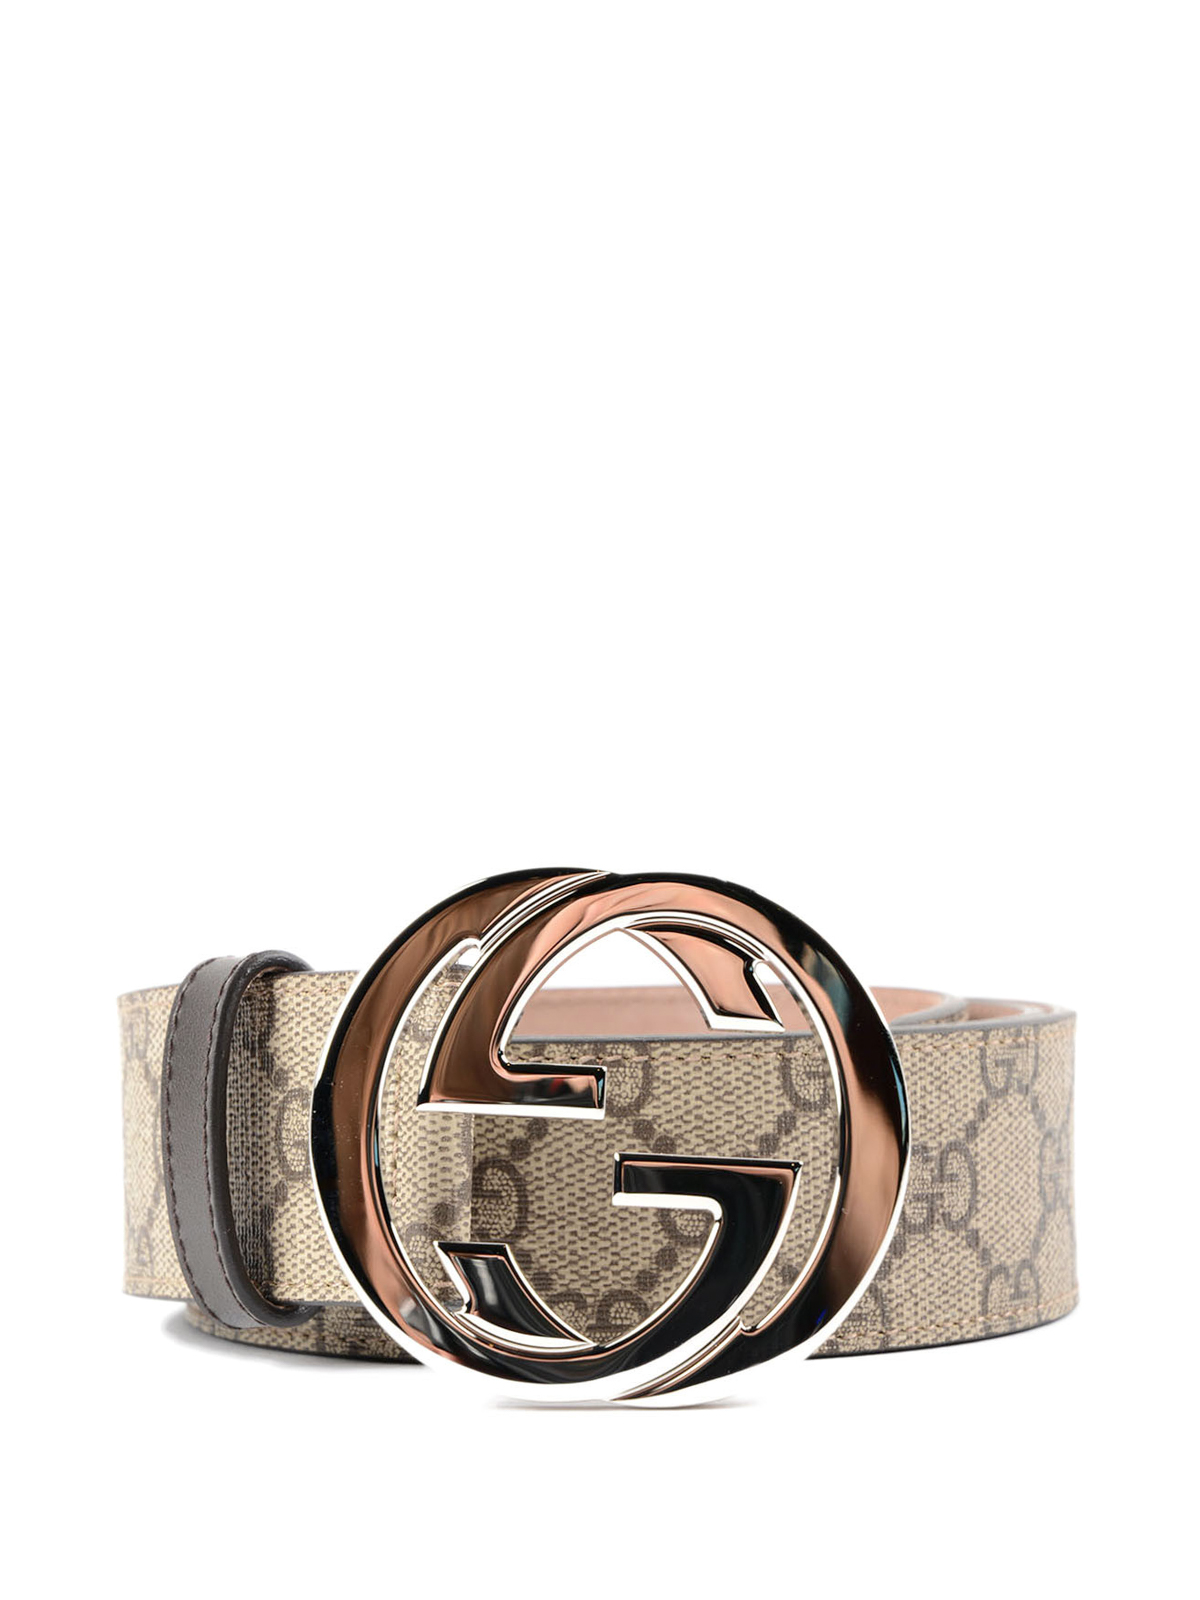 Gucci - Cinturón - Gg Supreme - Cinturones - 411924KGDHN9643  be4c032b722